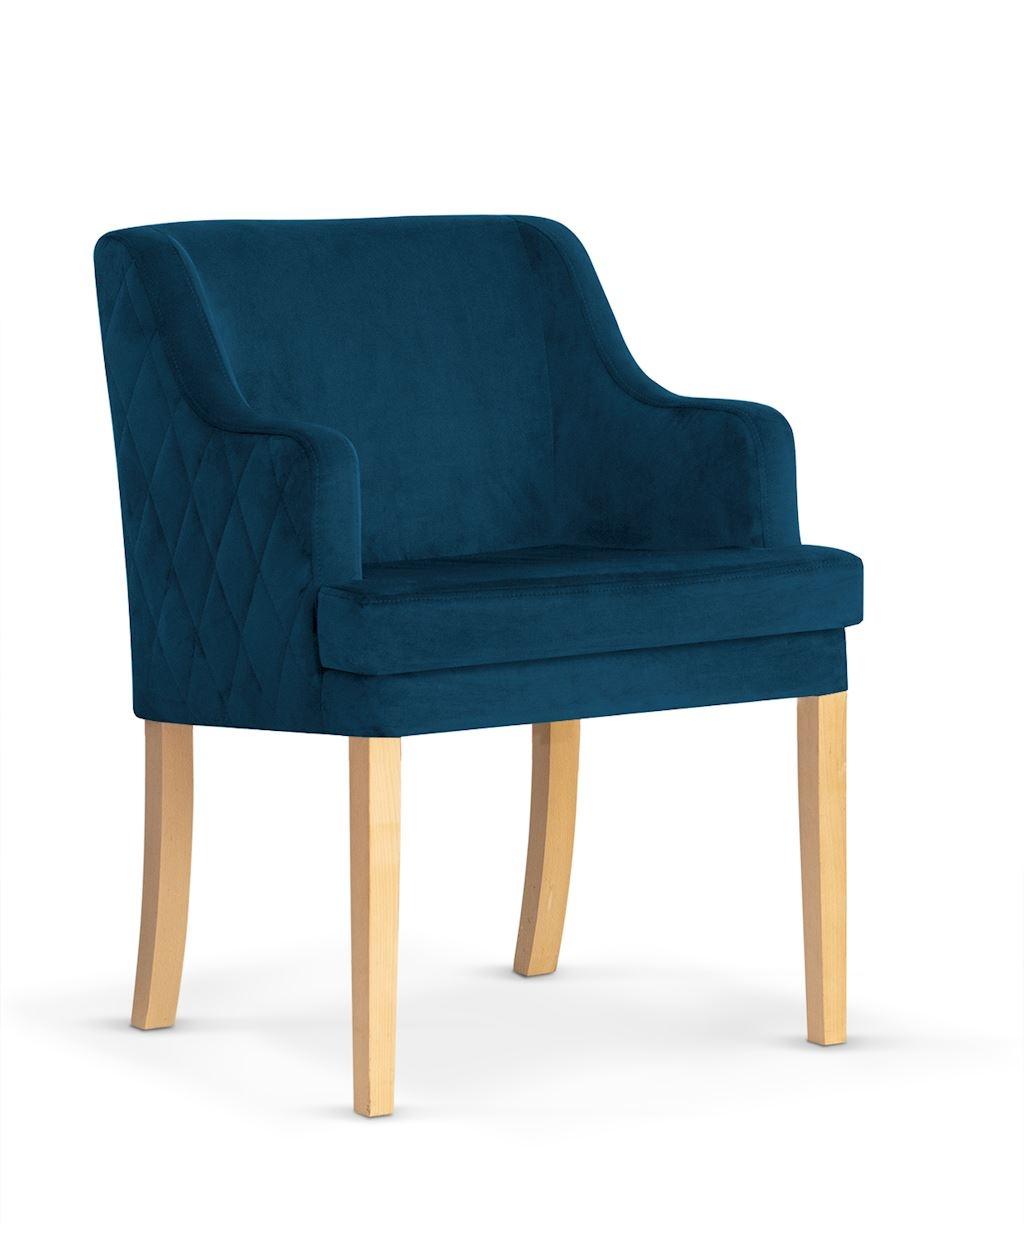 Fotoliu fix tapitat cu stofa, cu picioare din lemn Grand Navy Blue / Oak, l58xA60xH89 cm imagine